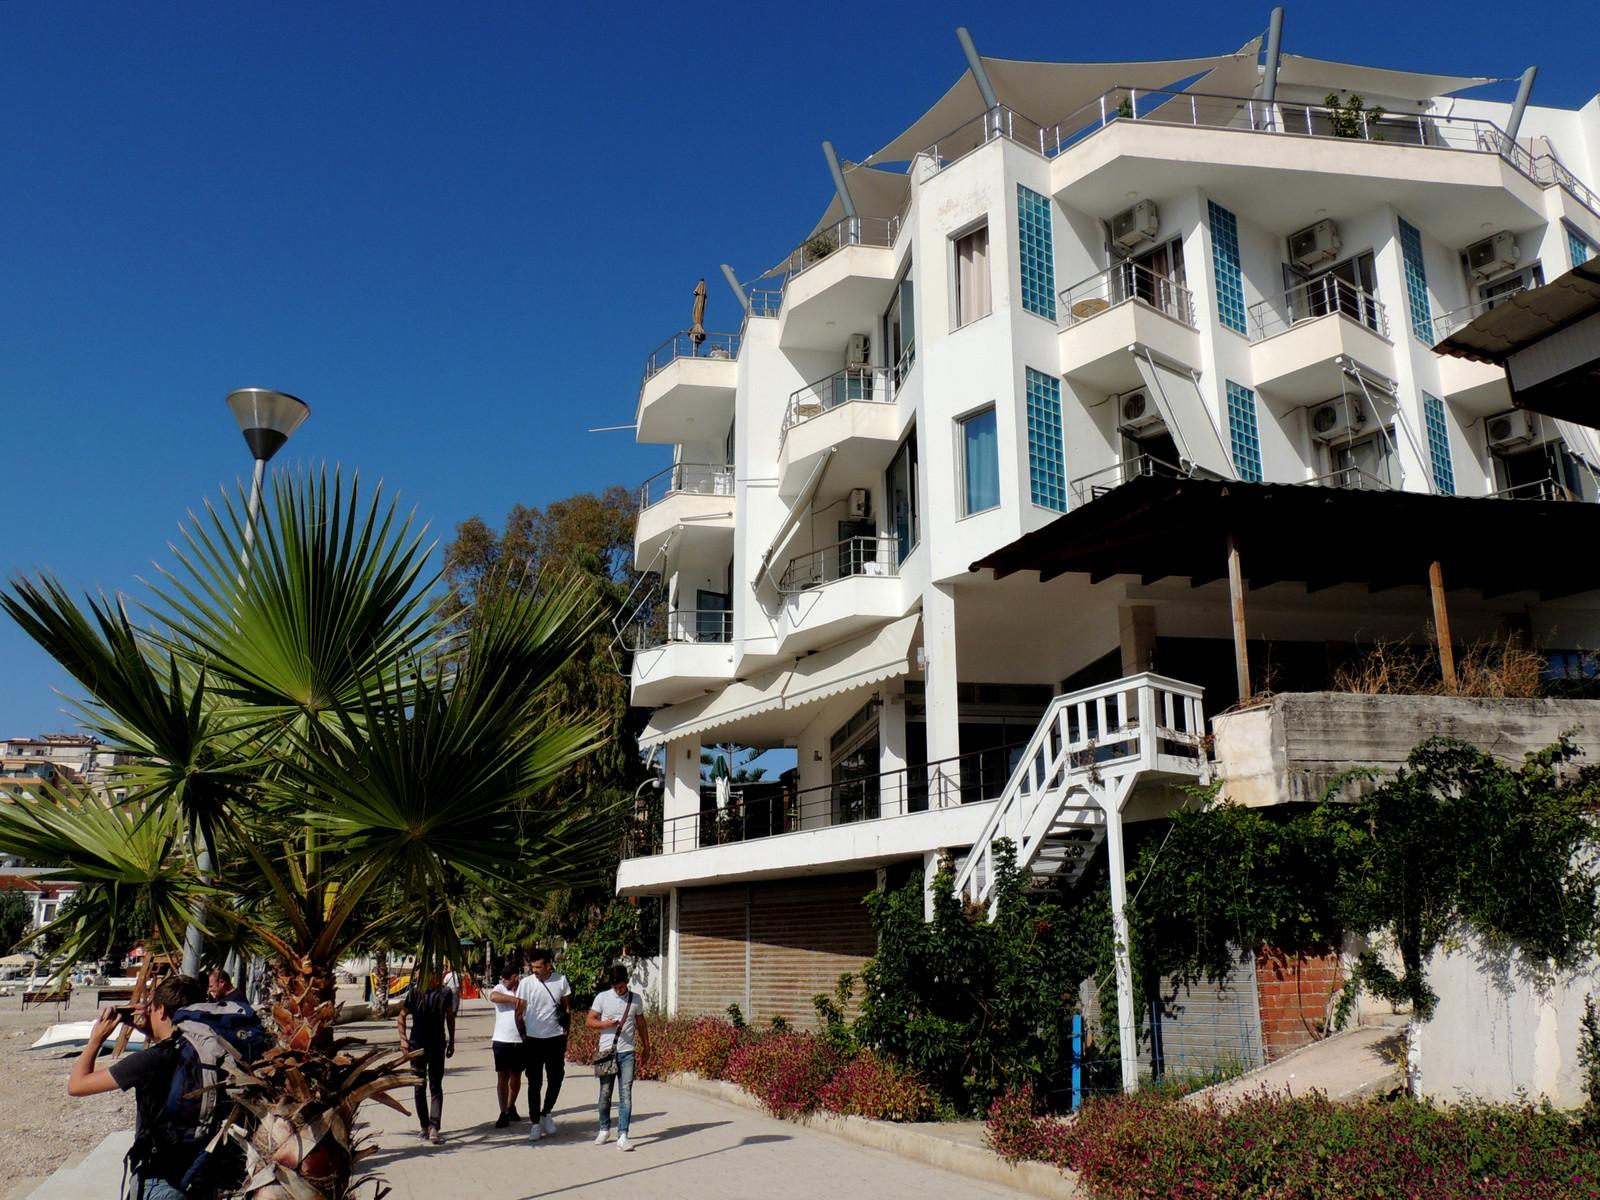 Hotel Titania mit Strandpromenade - Saranda in Albanien